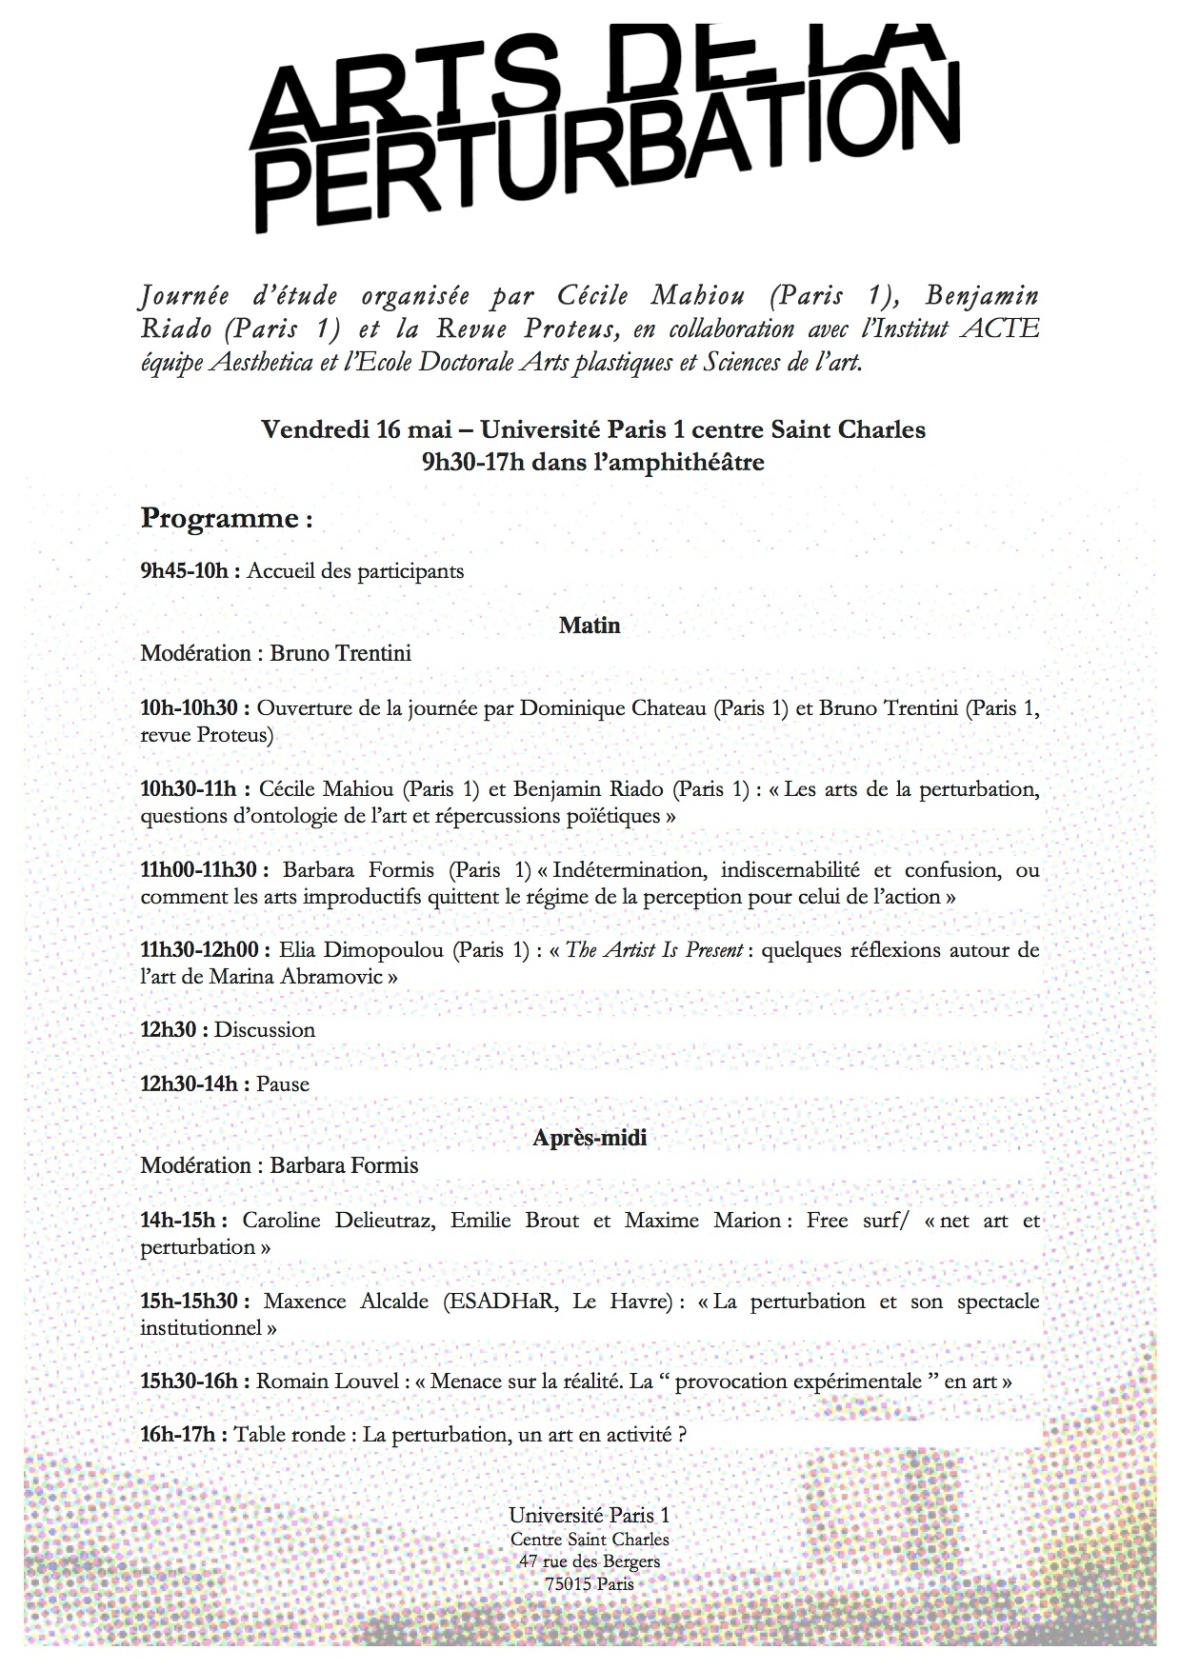 PerturbationProgramme